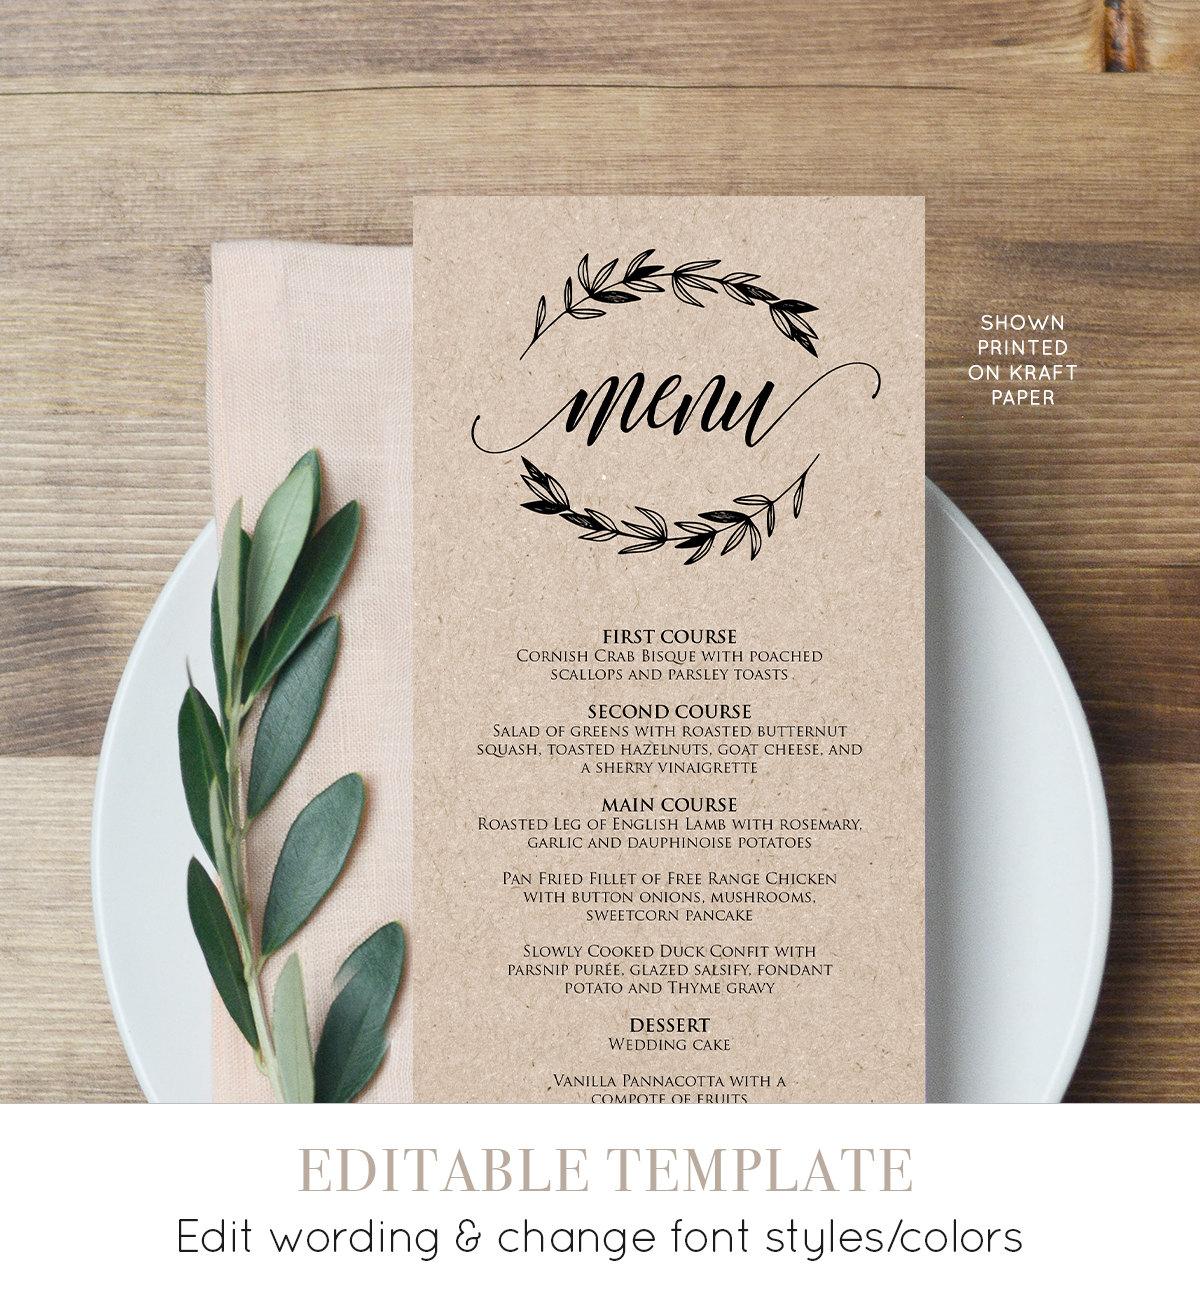 rustic wedding menu template printable menu card. Black Bedroom Furniture Sets. Home Design Ideas